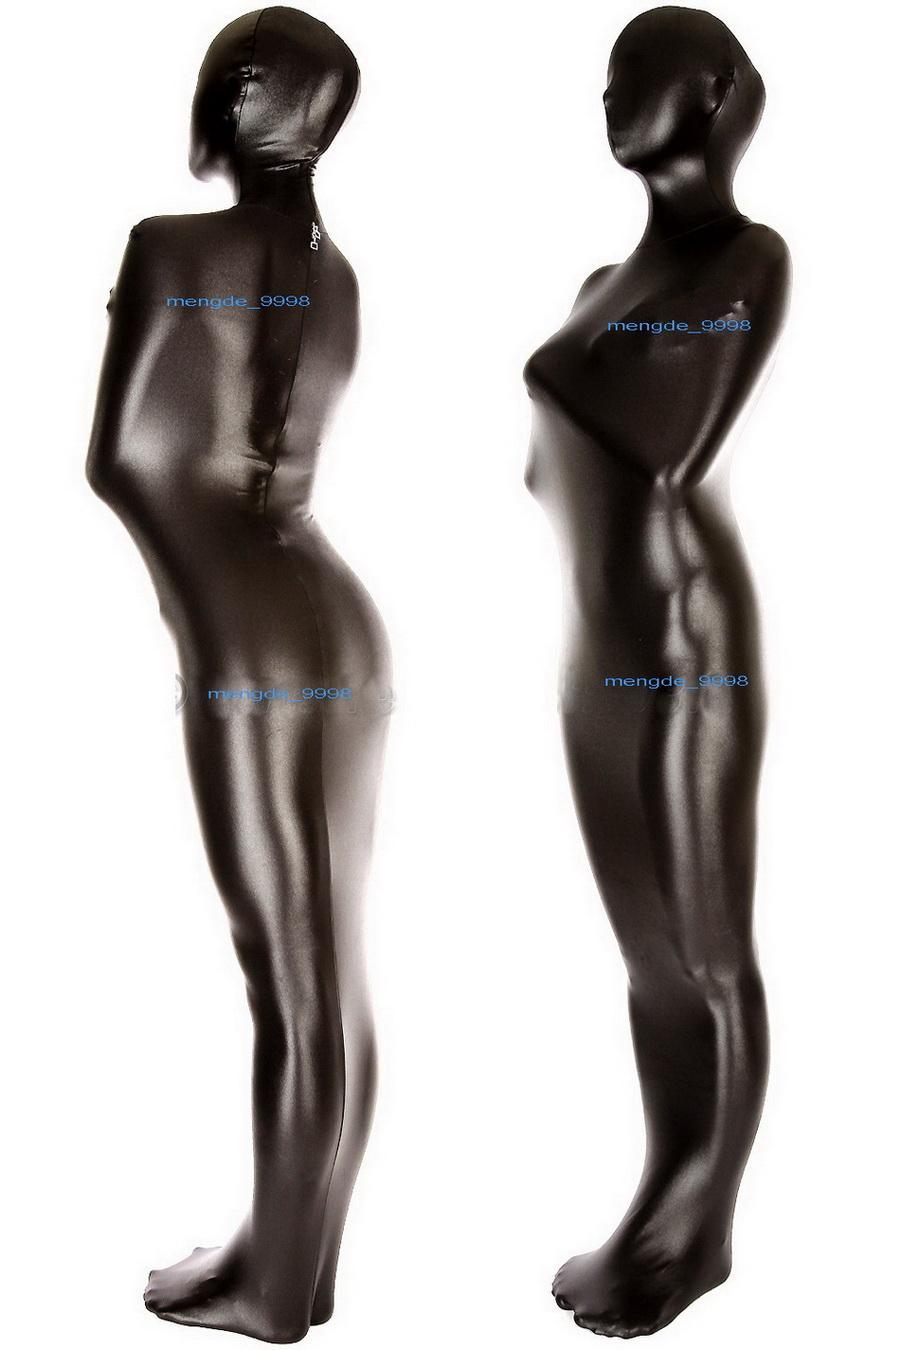 Unisex Full Mummy Costumes Black Shiny Metallic Bag Sleeping Bag Back Zip Sexy Donne da uomo Borse per il corpo Sleepsacks Catsuit Costume Costume Halloween Fancy Dress Cosplay Vestito M082